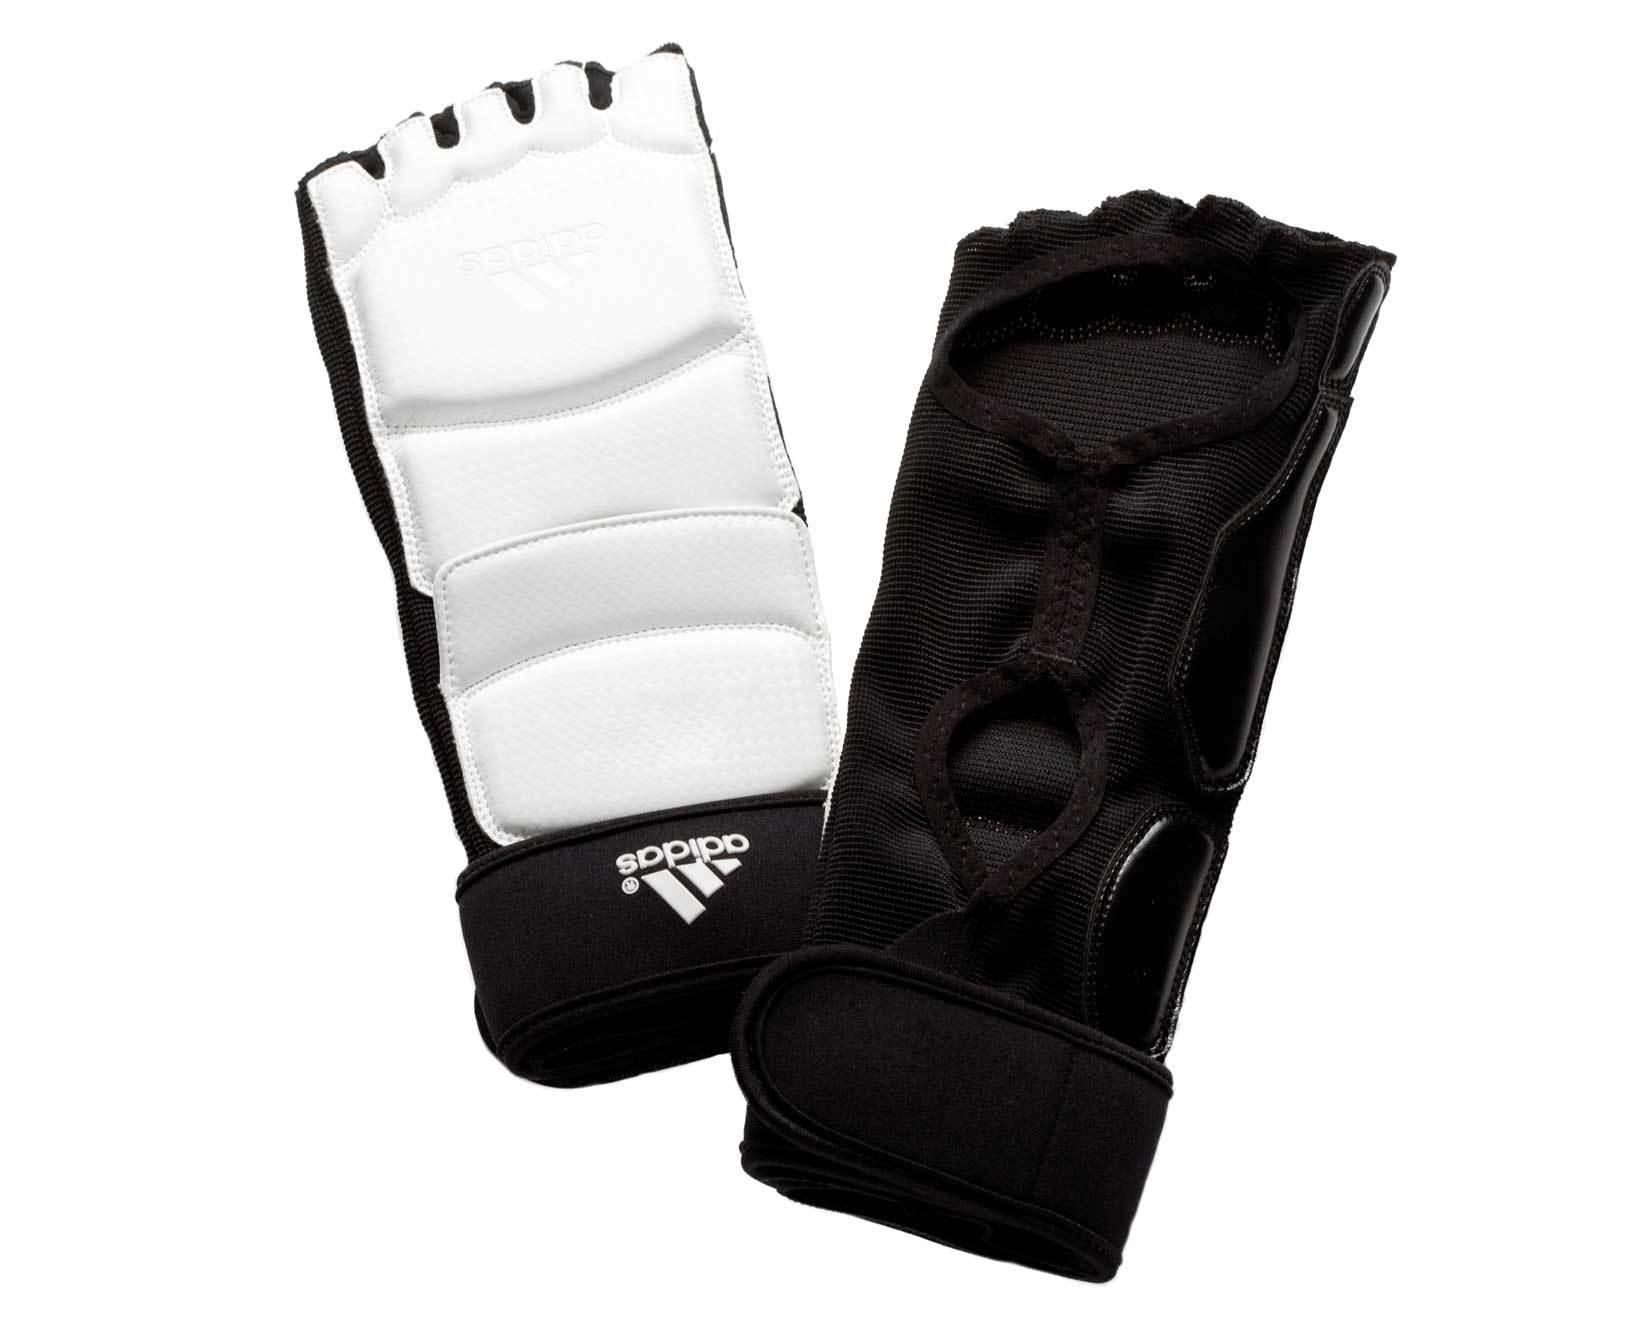 Защита голени/футы Защита стопы для тхэквондо WTF Foot Socks белая zashchita_stopy_dlya_tkhekvondo_wtf_foot_socks_belaya.jpg